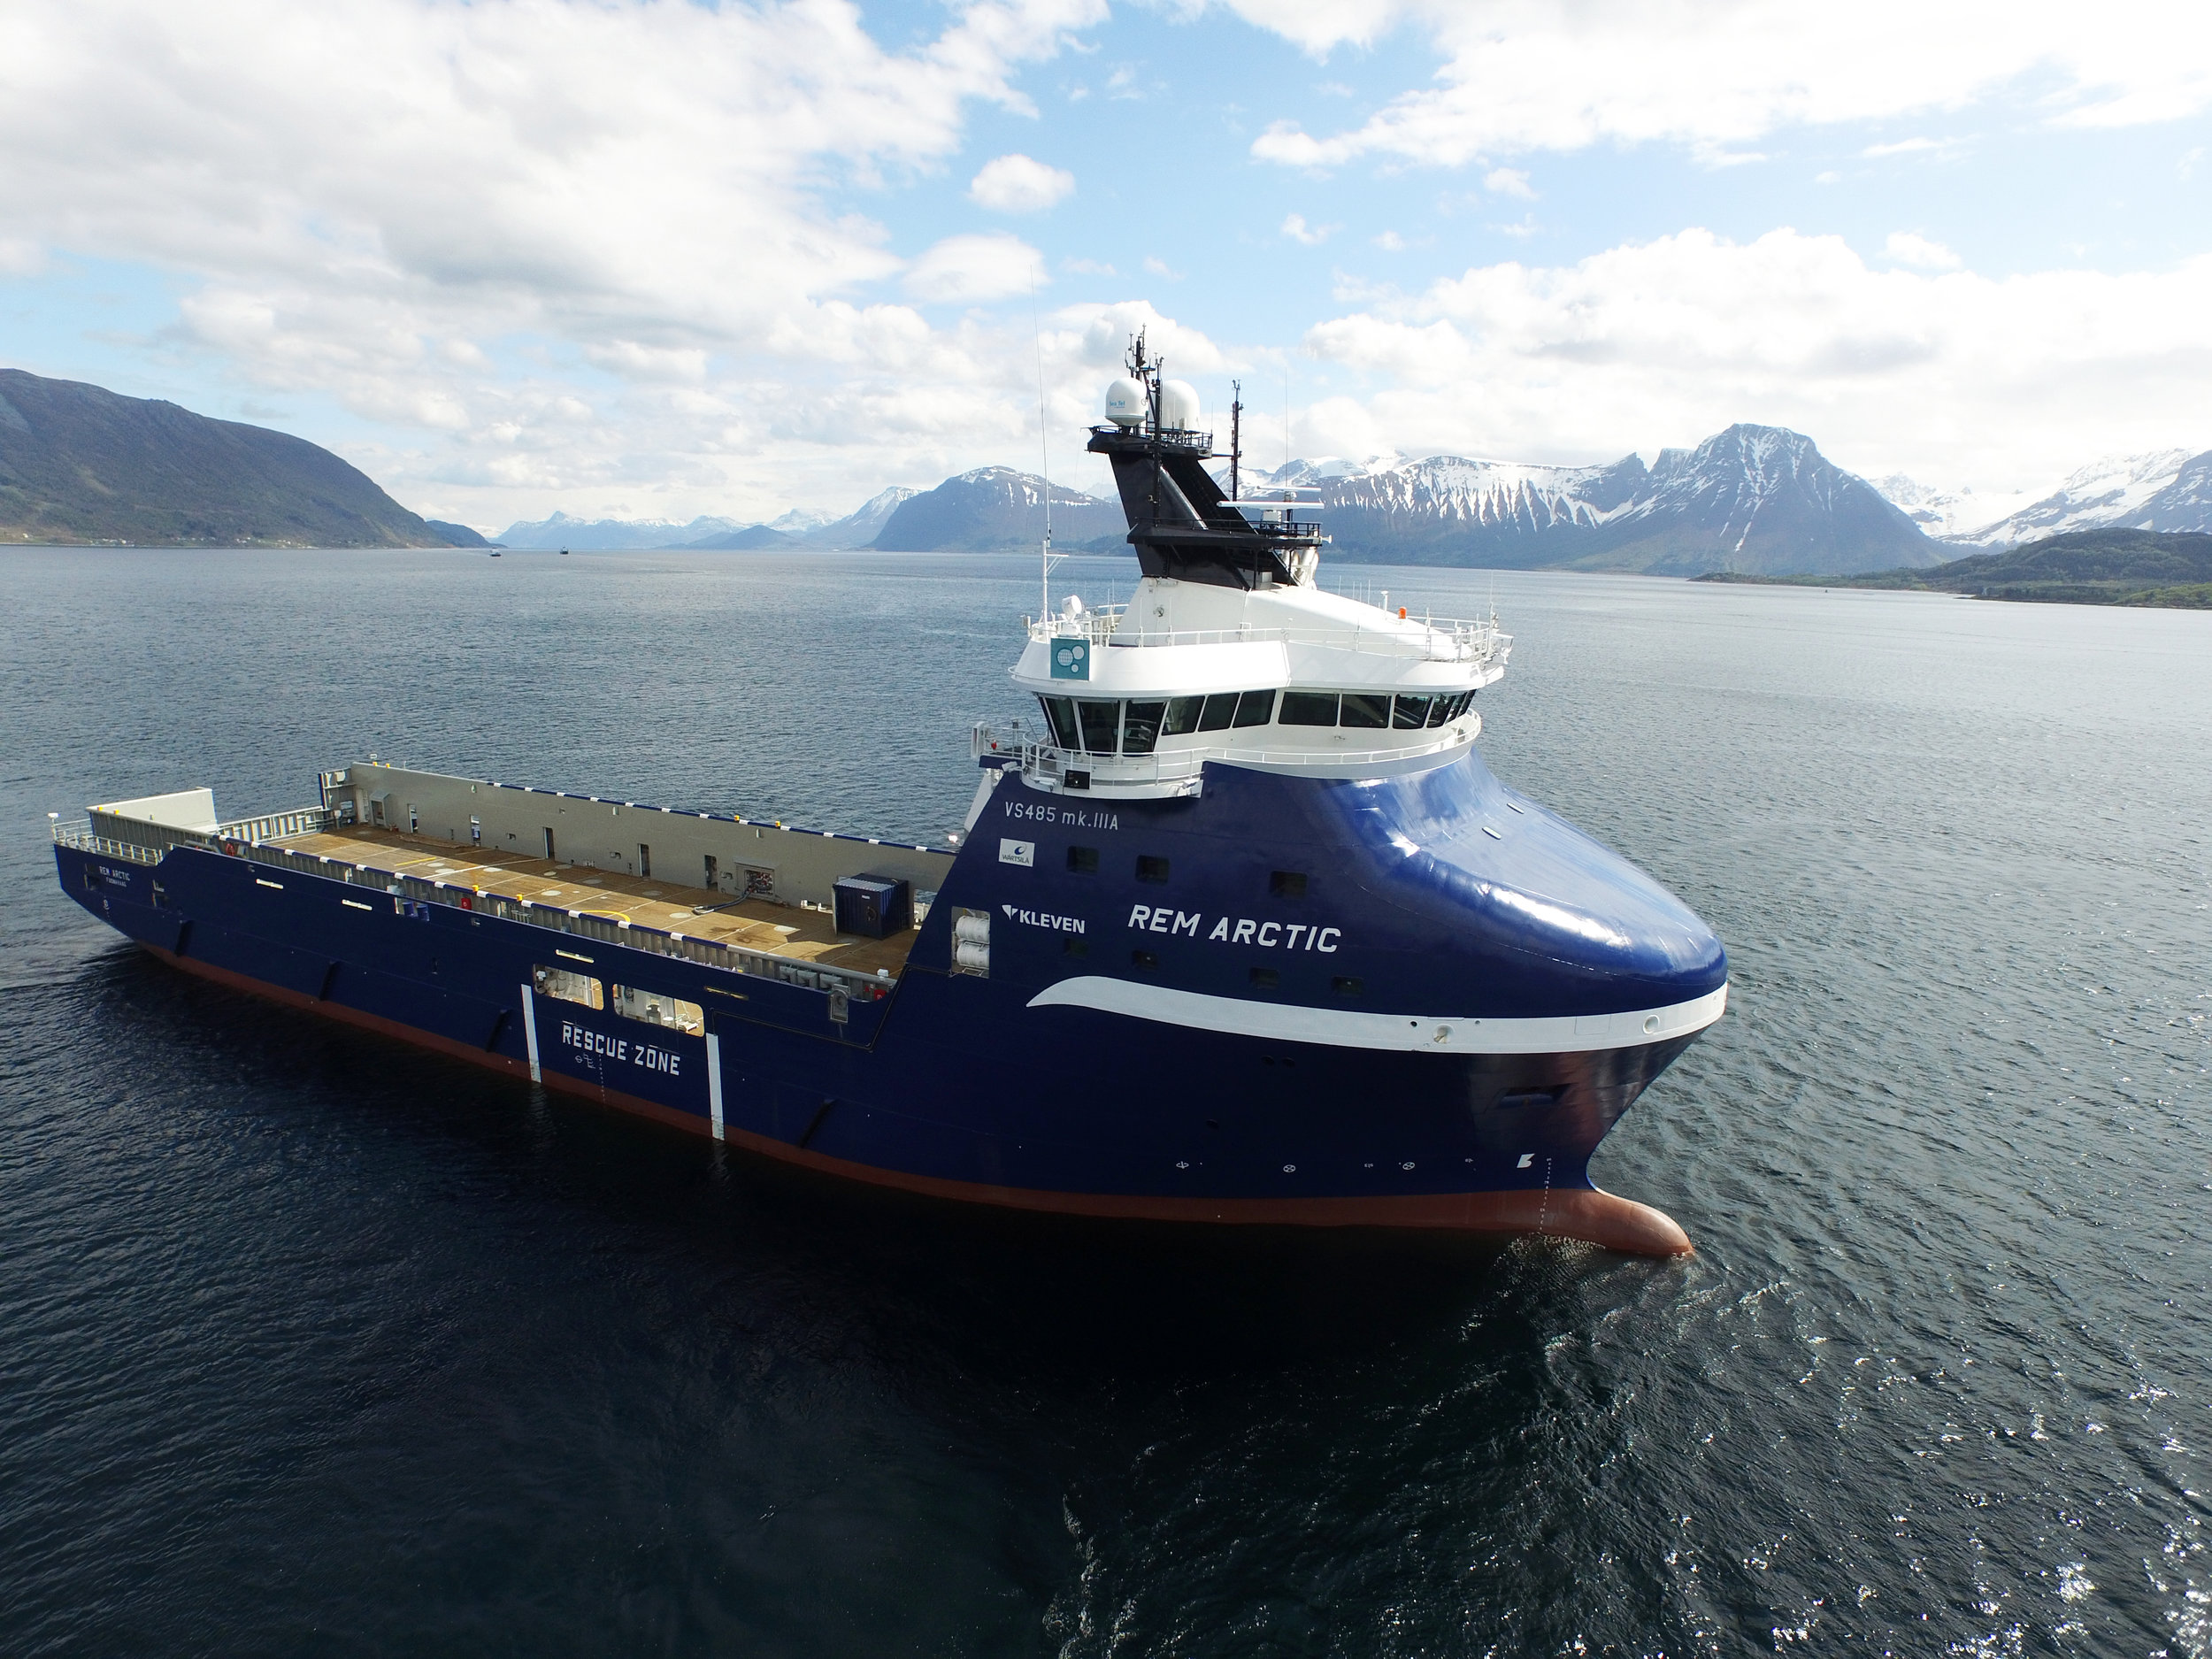 Rem Arctic on sea trials, May 2015  Photo: www.uavpic.com